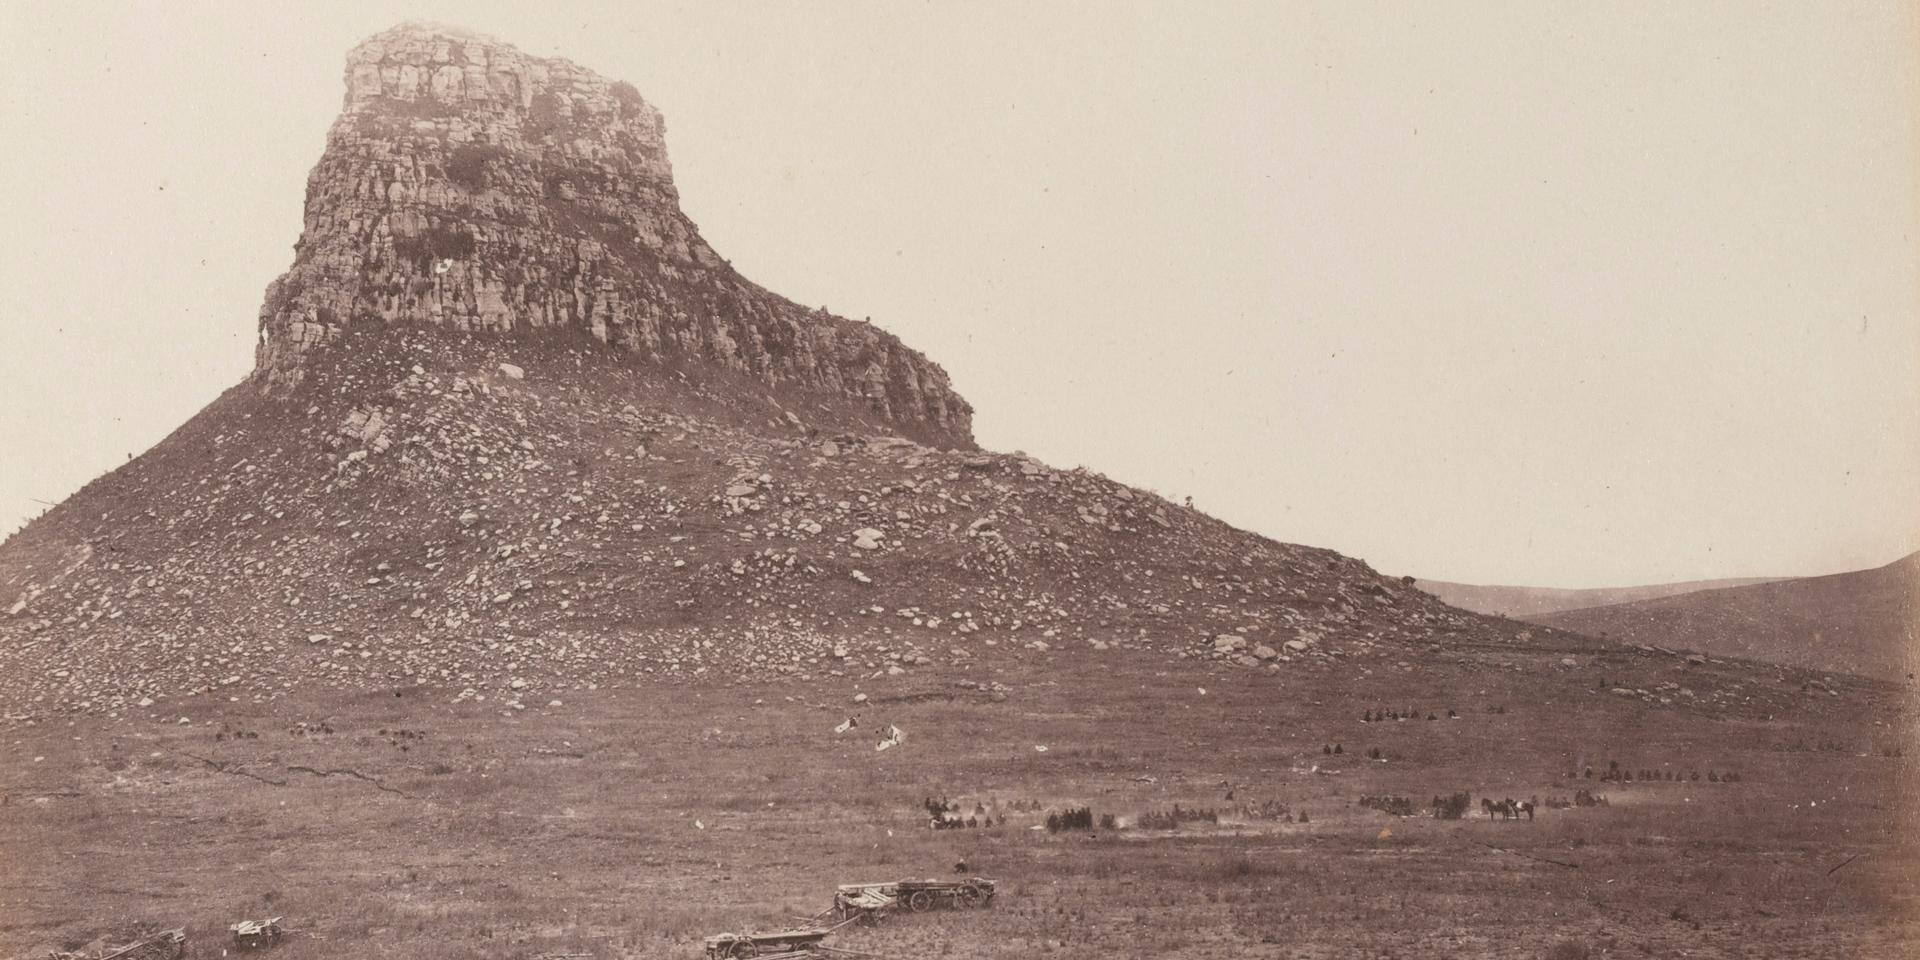 Isandlwana battlefield photographed,  June 1879